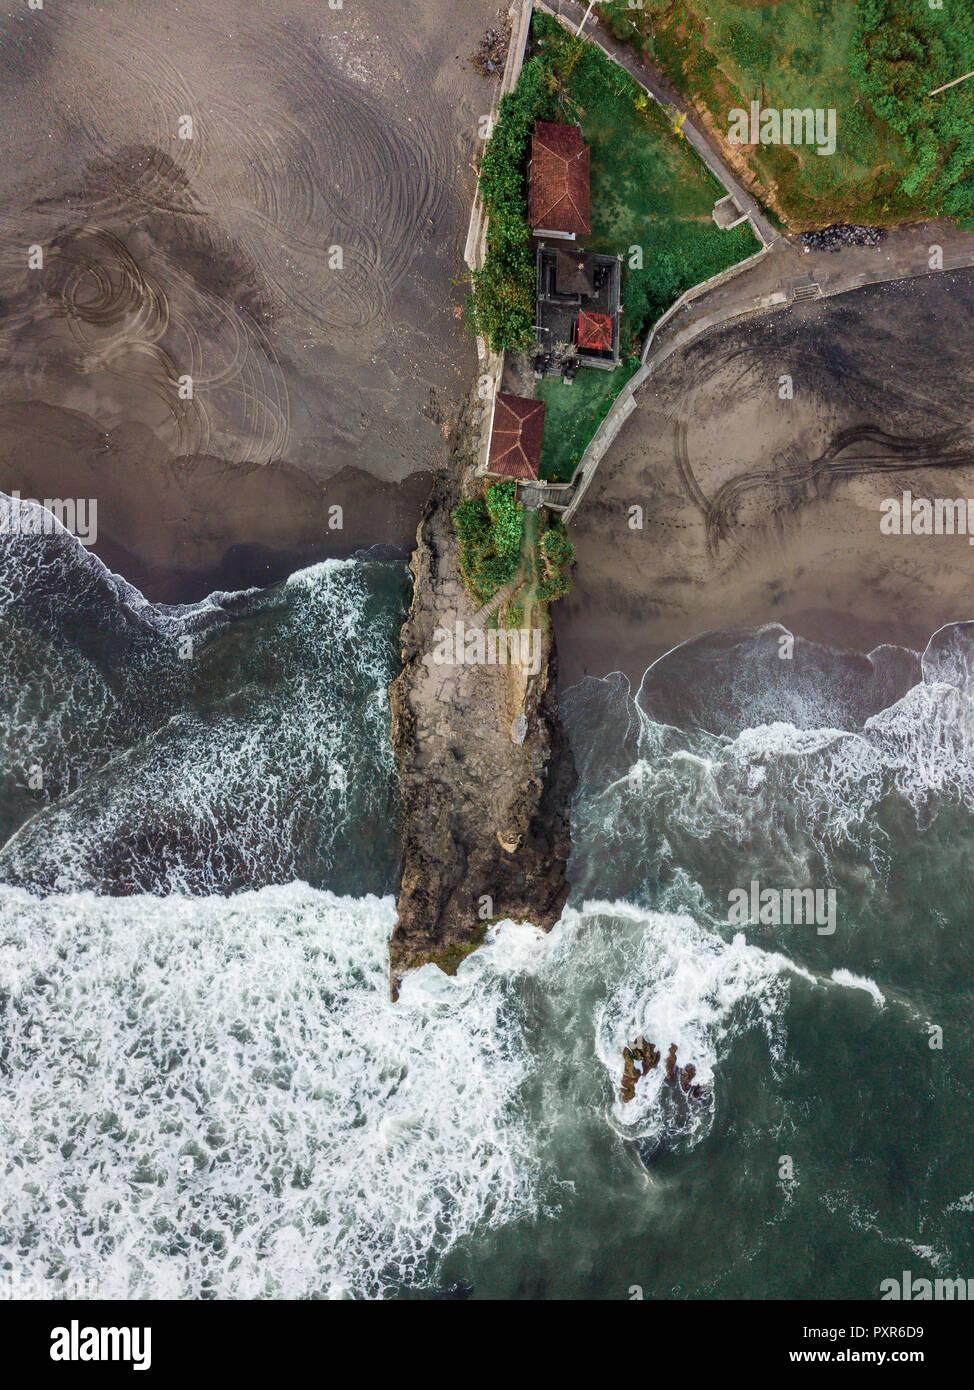 Indonesia, Bali, Aerial view of Bali island, rocky beach Stock Photo